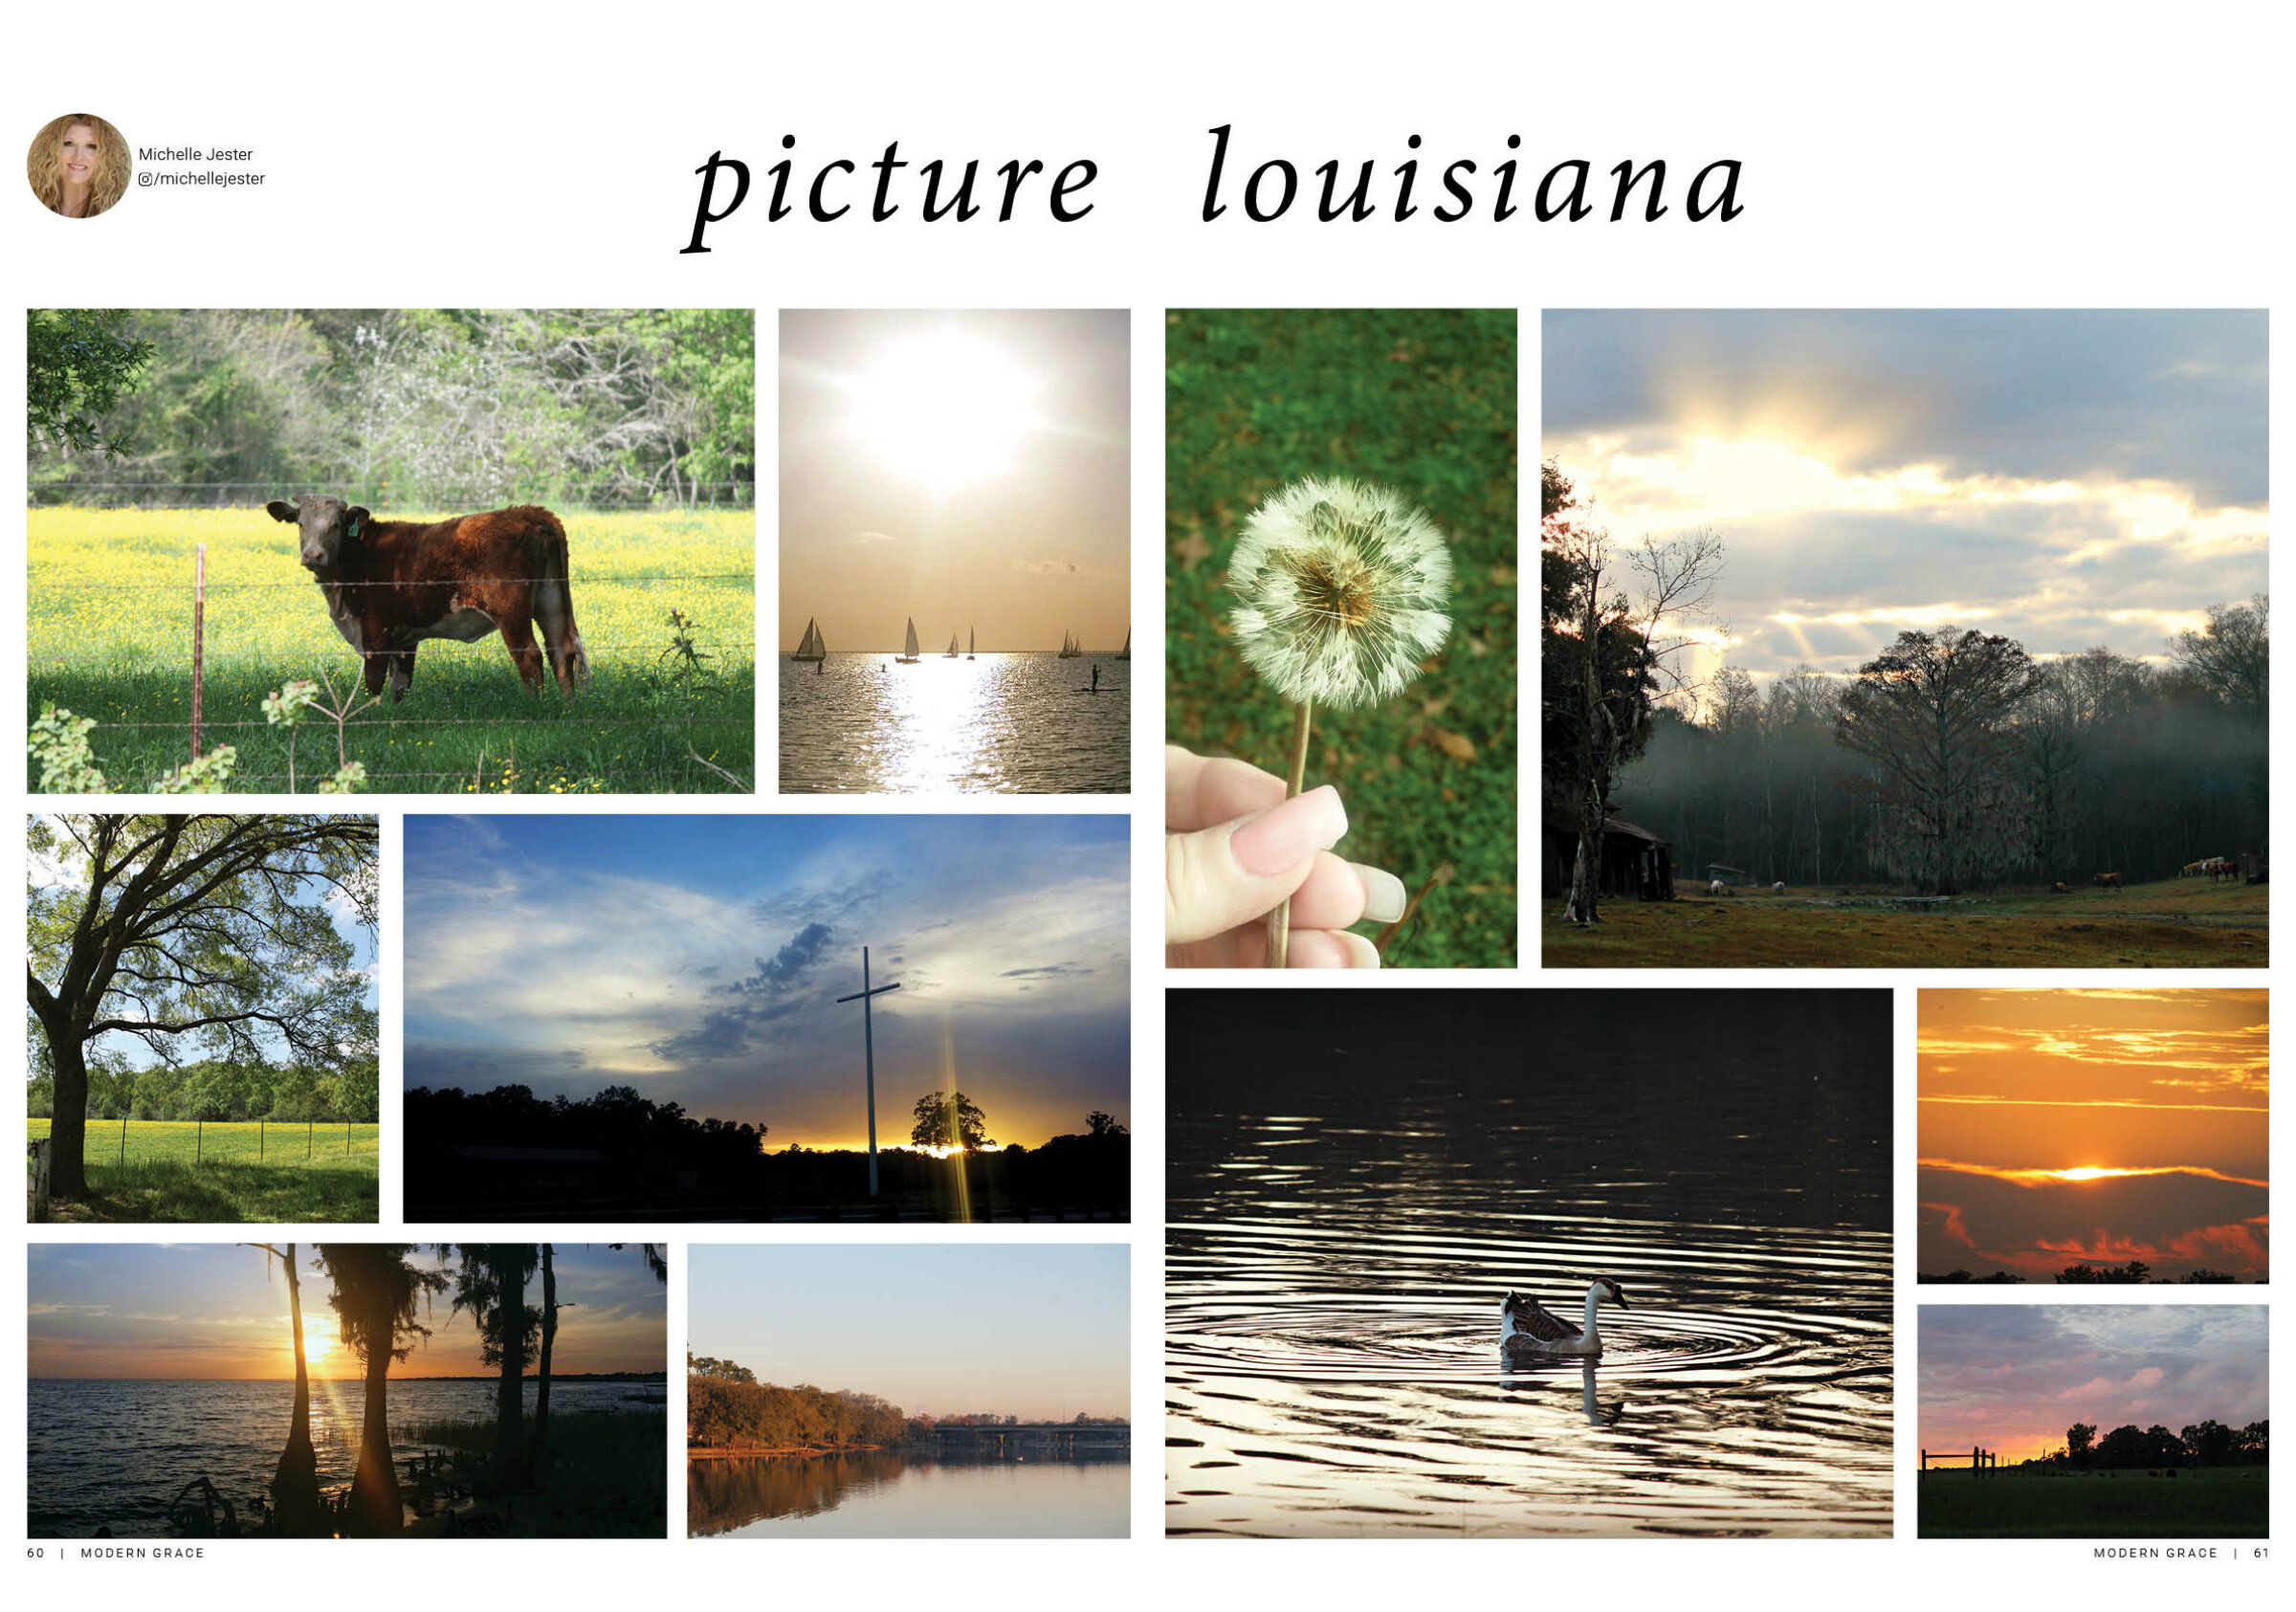 _Modern Grace Magazine fall 2019 Michelle Jester - Picture Louisiana.jpg